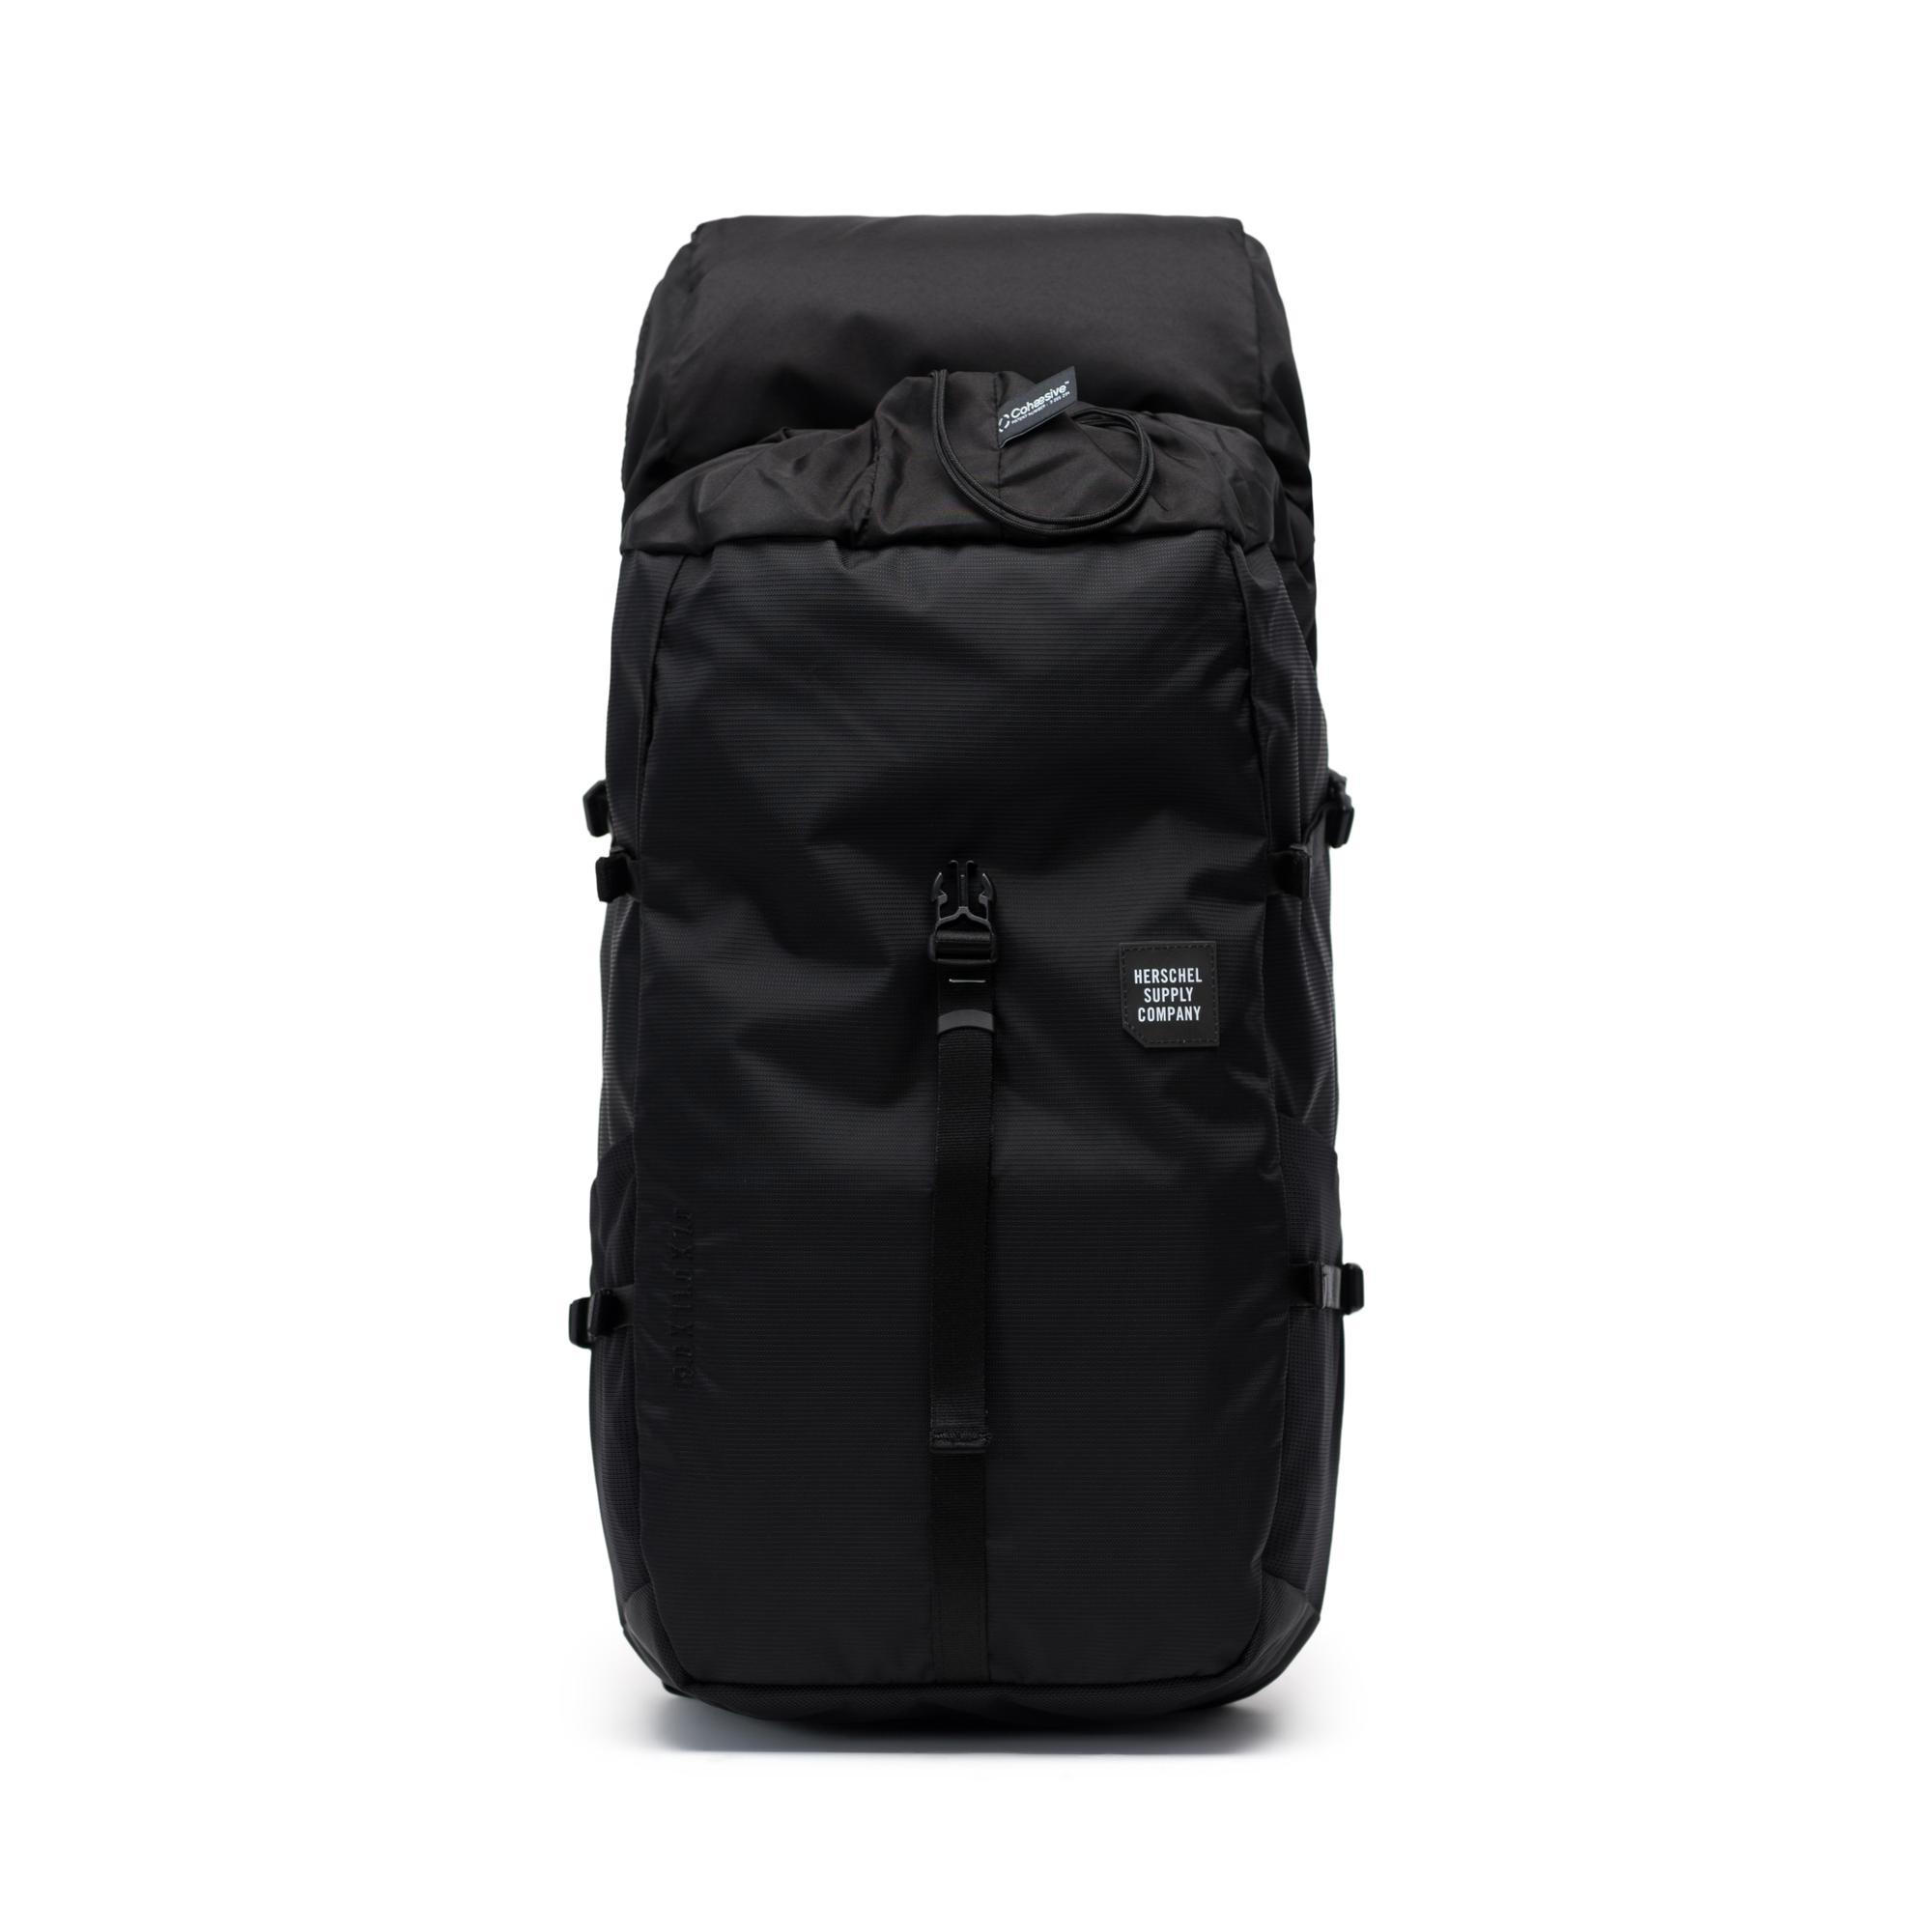 8995b4027b0 Barlow Backpack Large